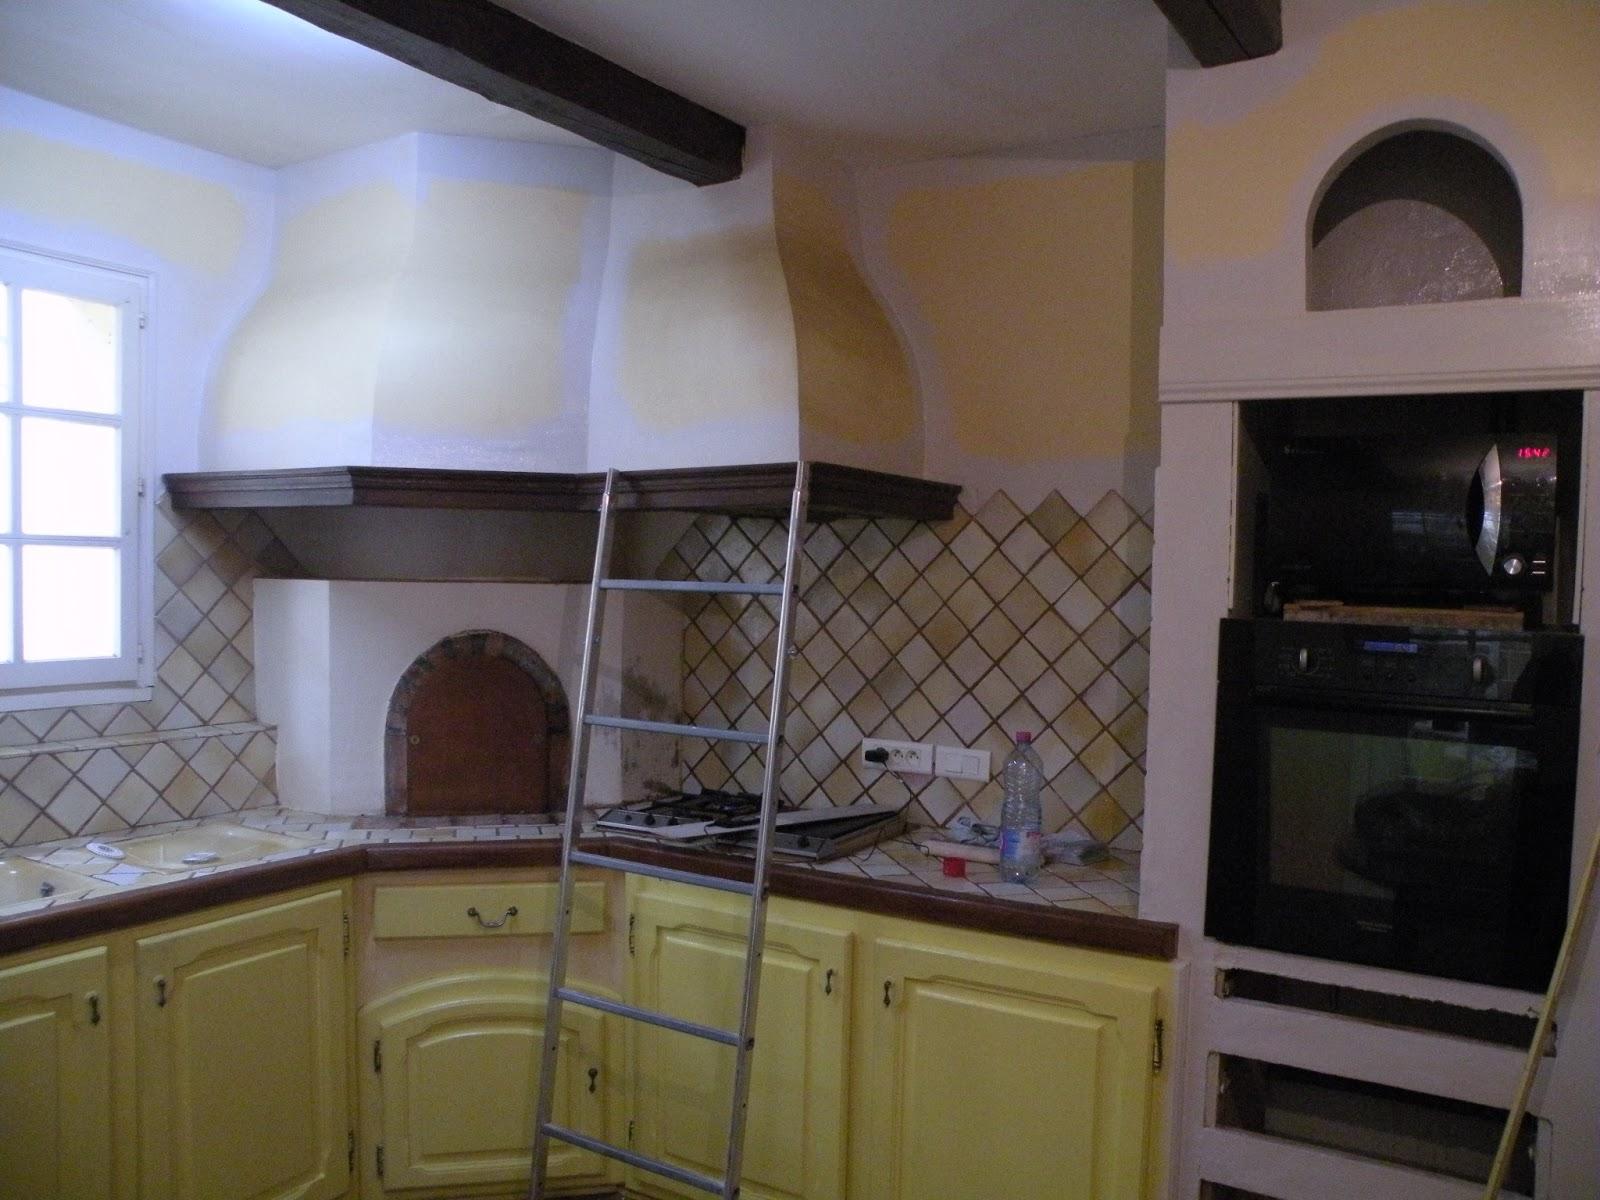 Changement de d cors la cuisine peinture mur et patine des portes de cuisine for Peinture cuisine tollens